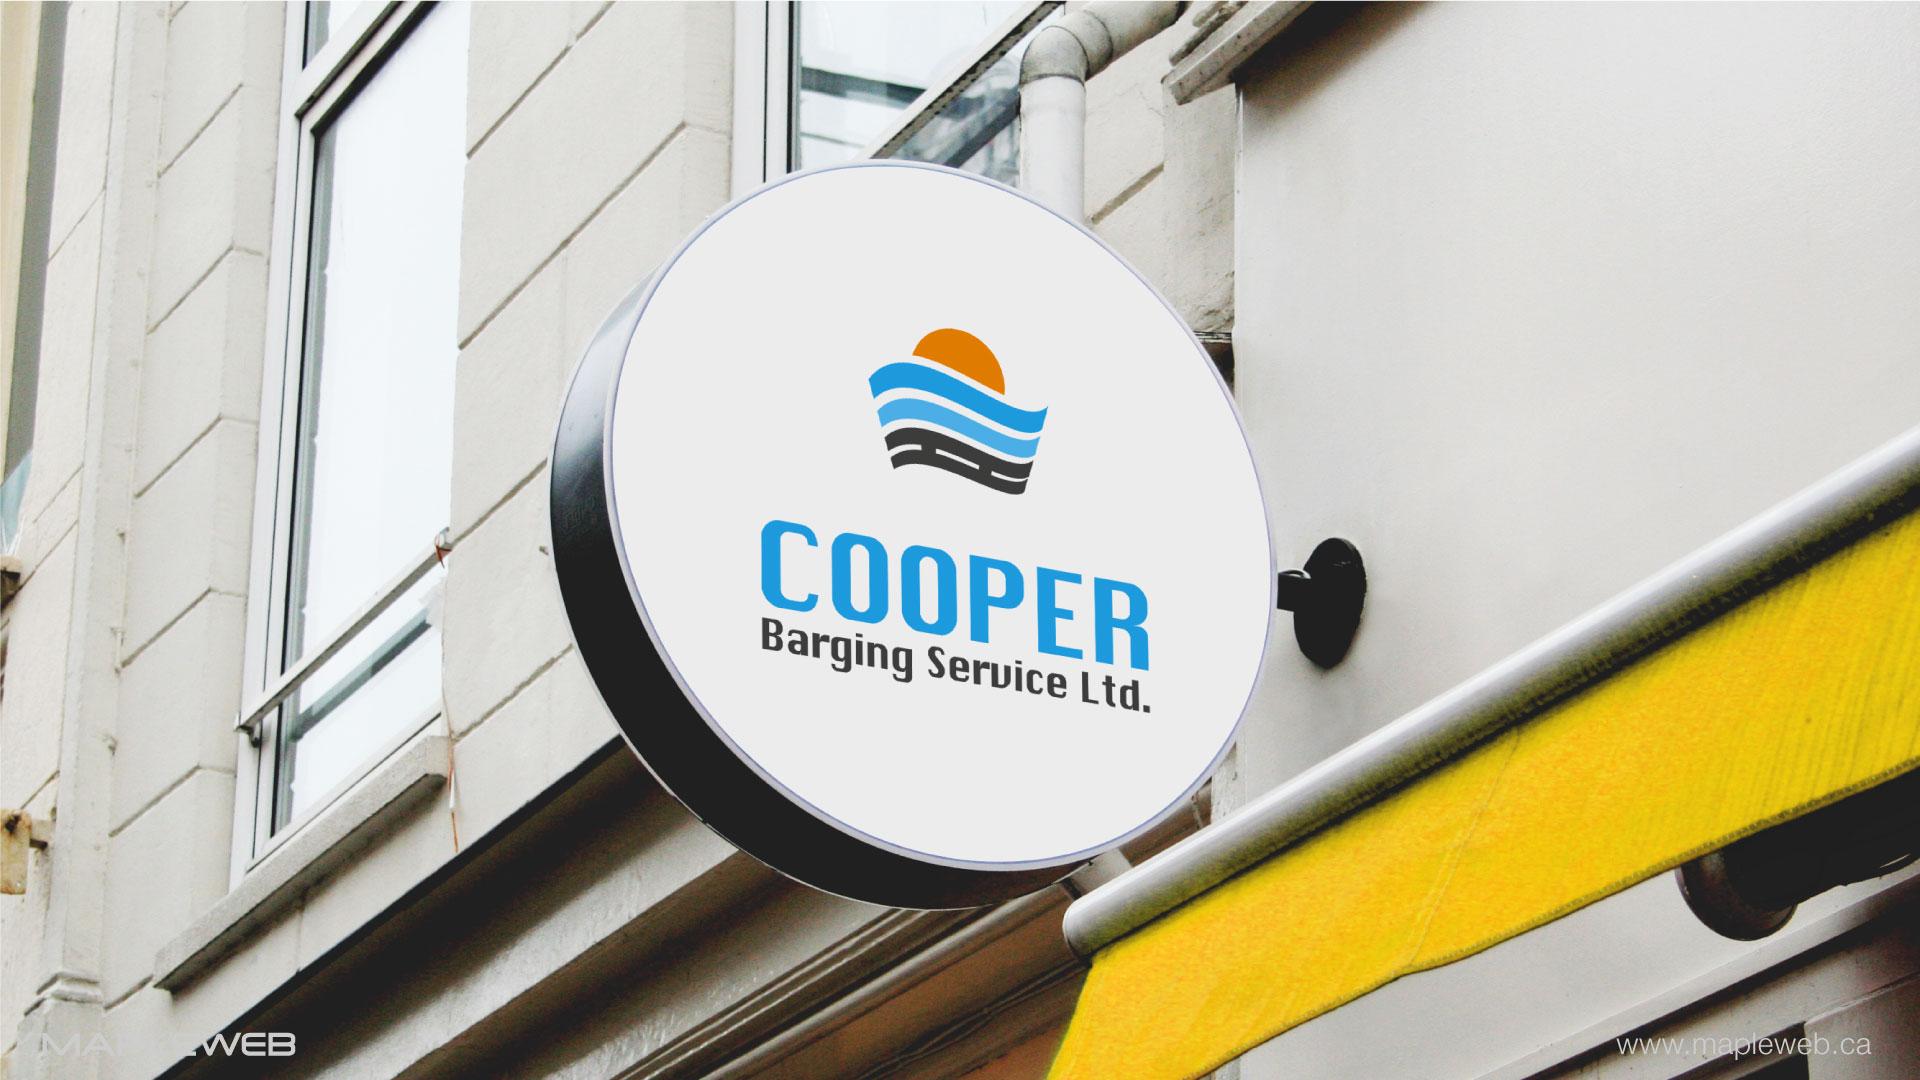 . cooper-barging-service-brand-logo-design-by-mapleweb-vancouver-canada-shop-outside-signage-mock